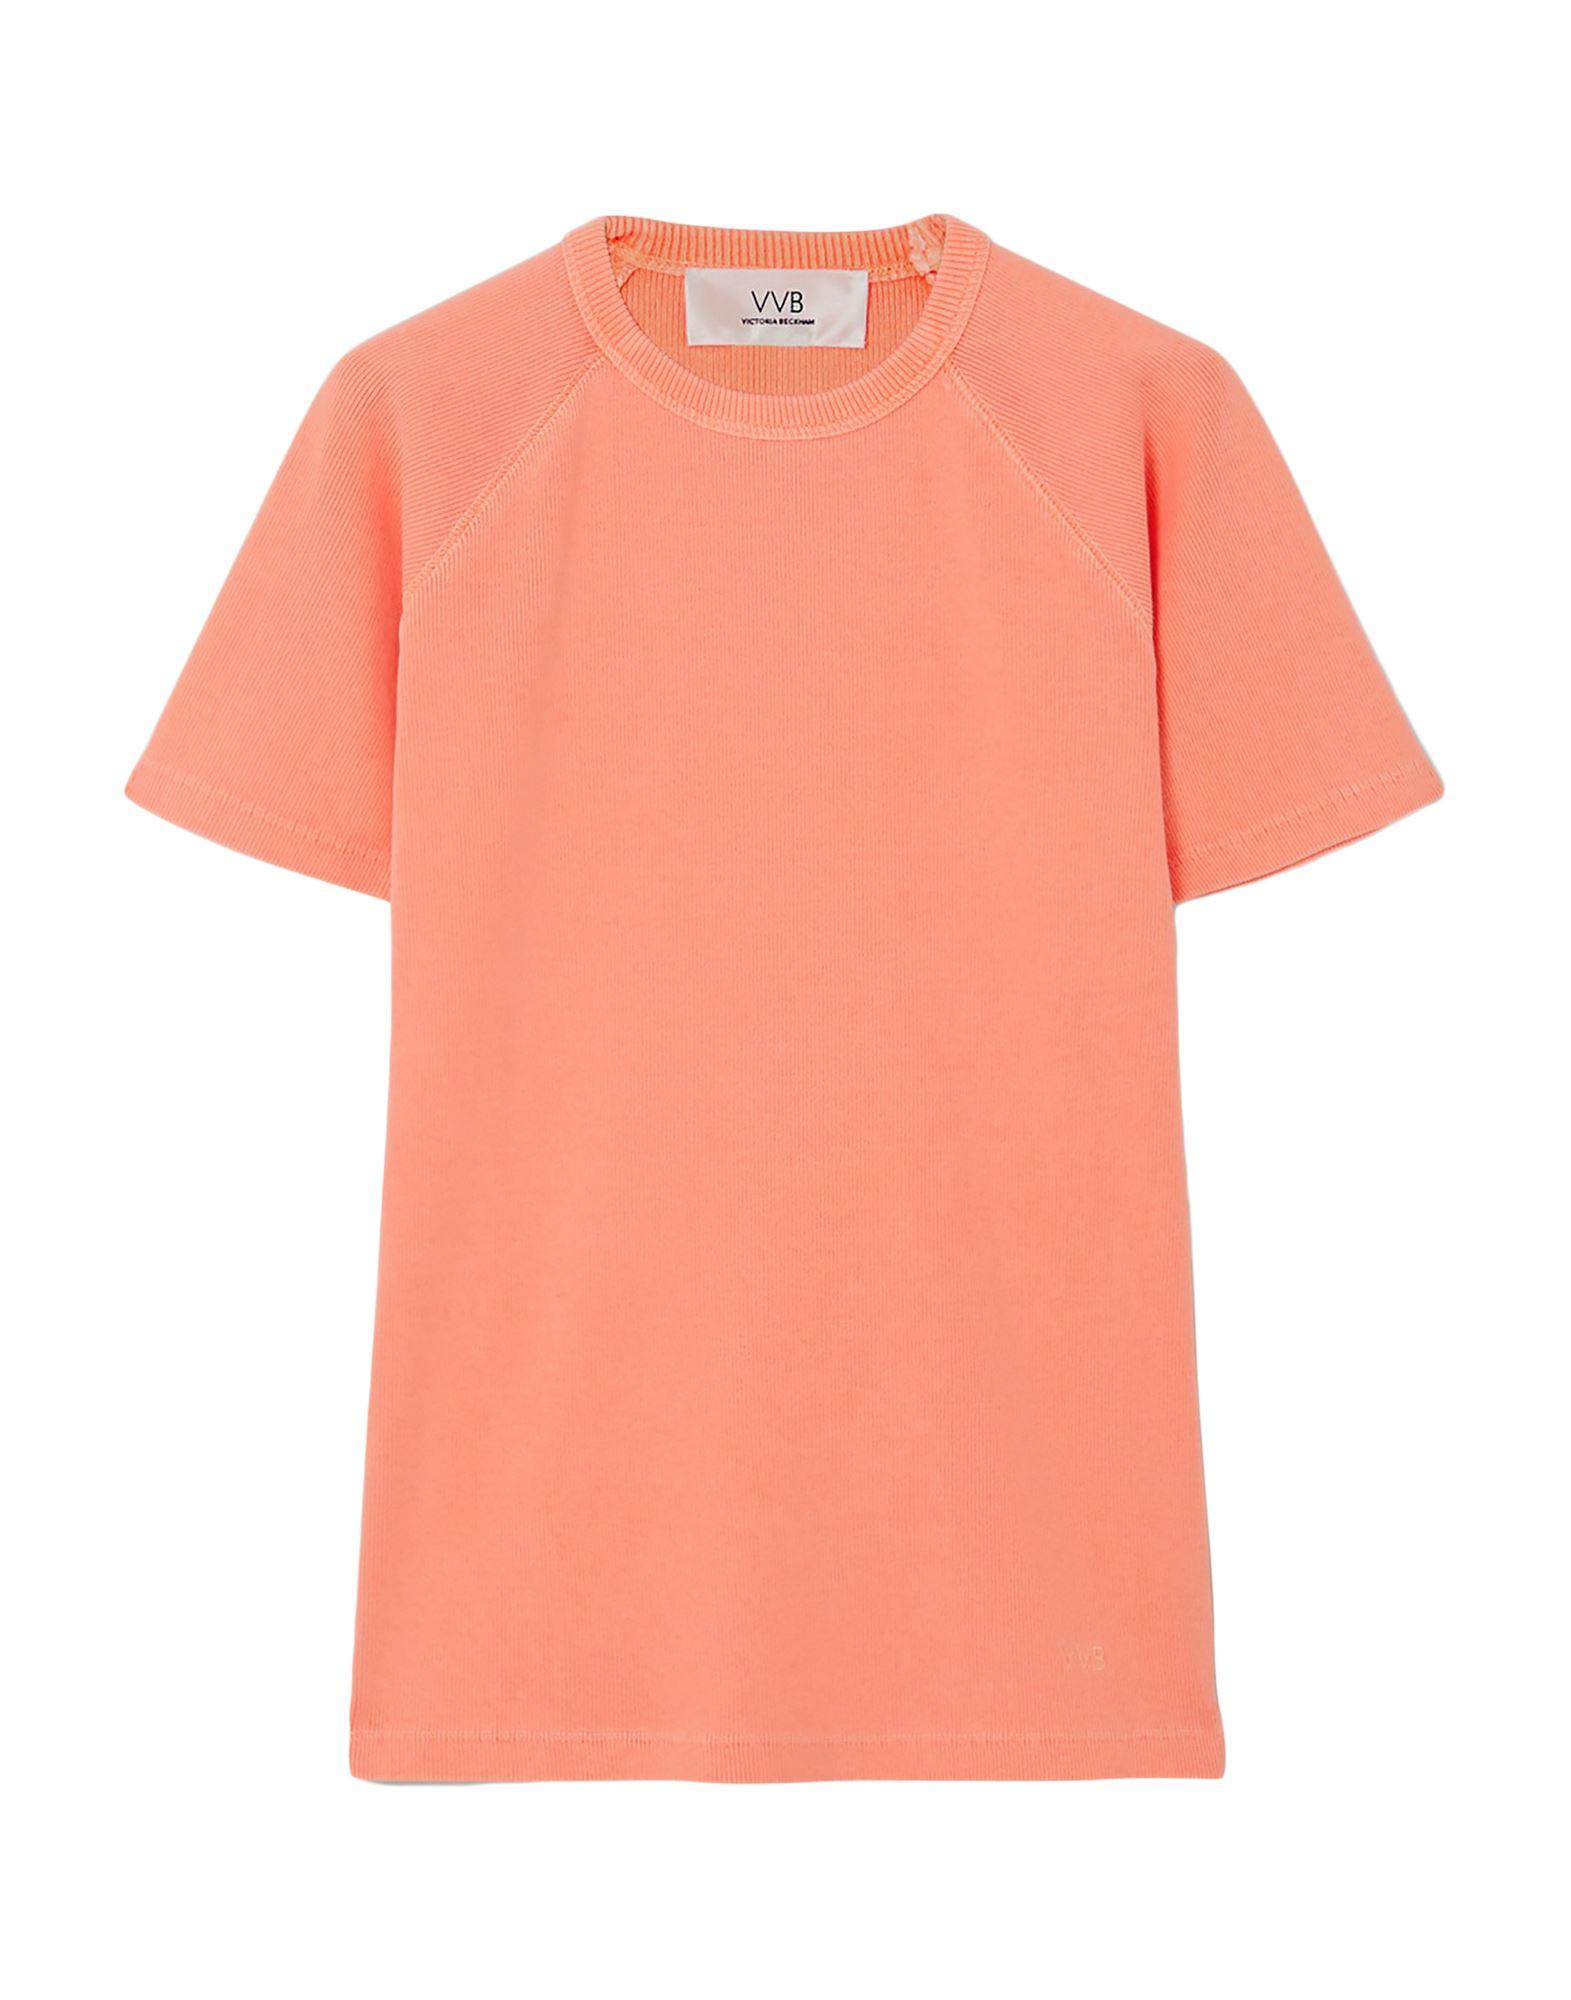 VICTORIA, VICTORIA BECKHAM T-shirts - Item 12550590